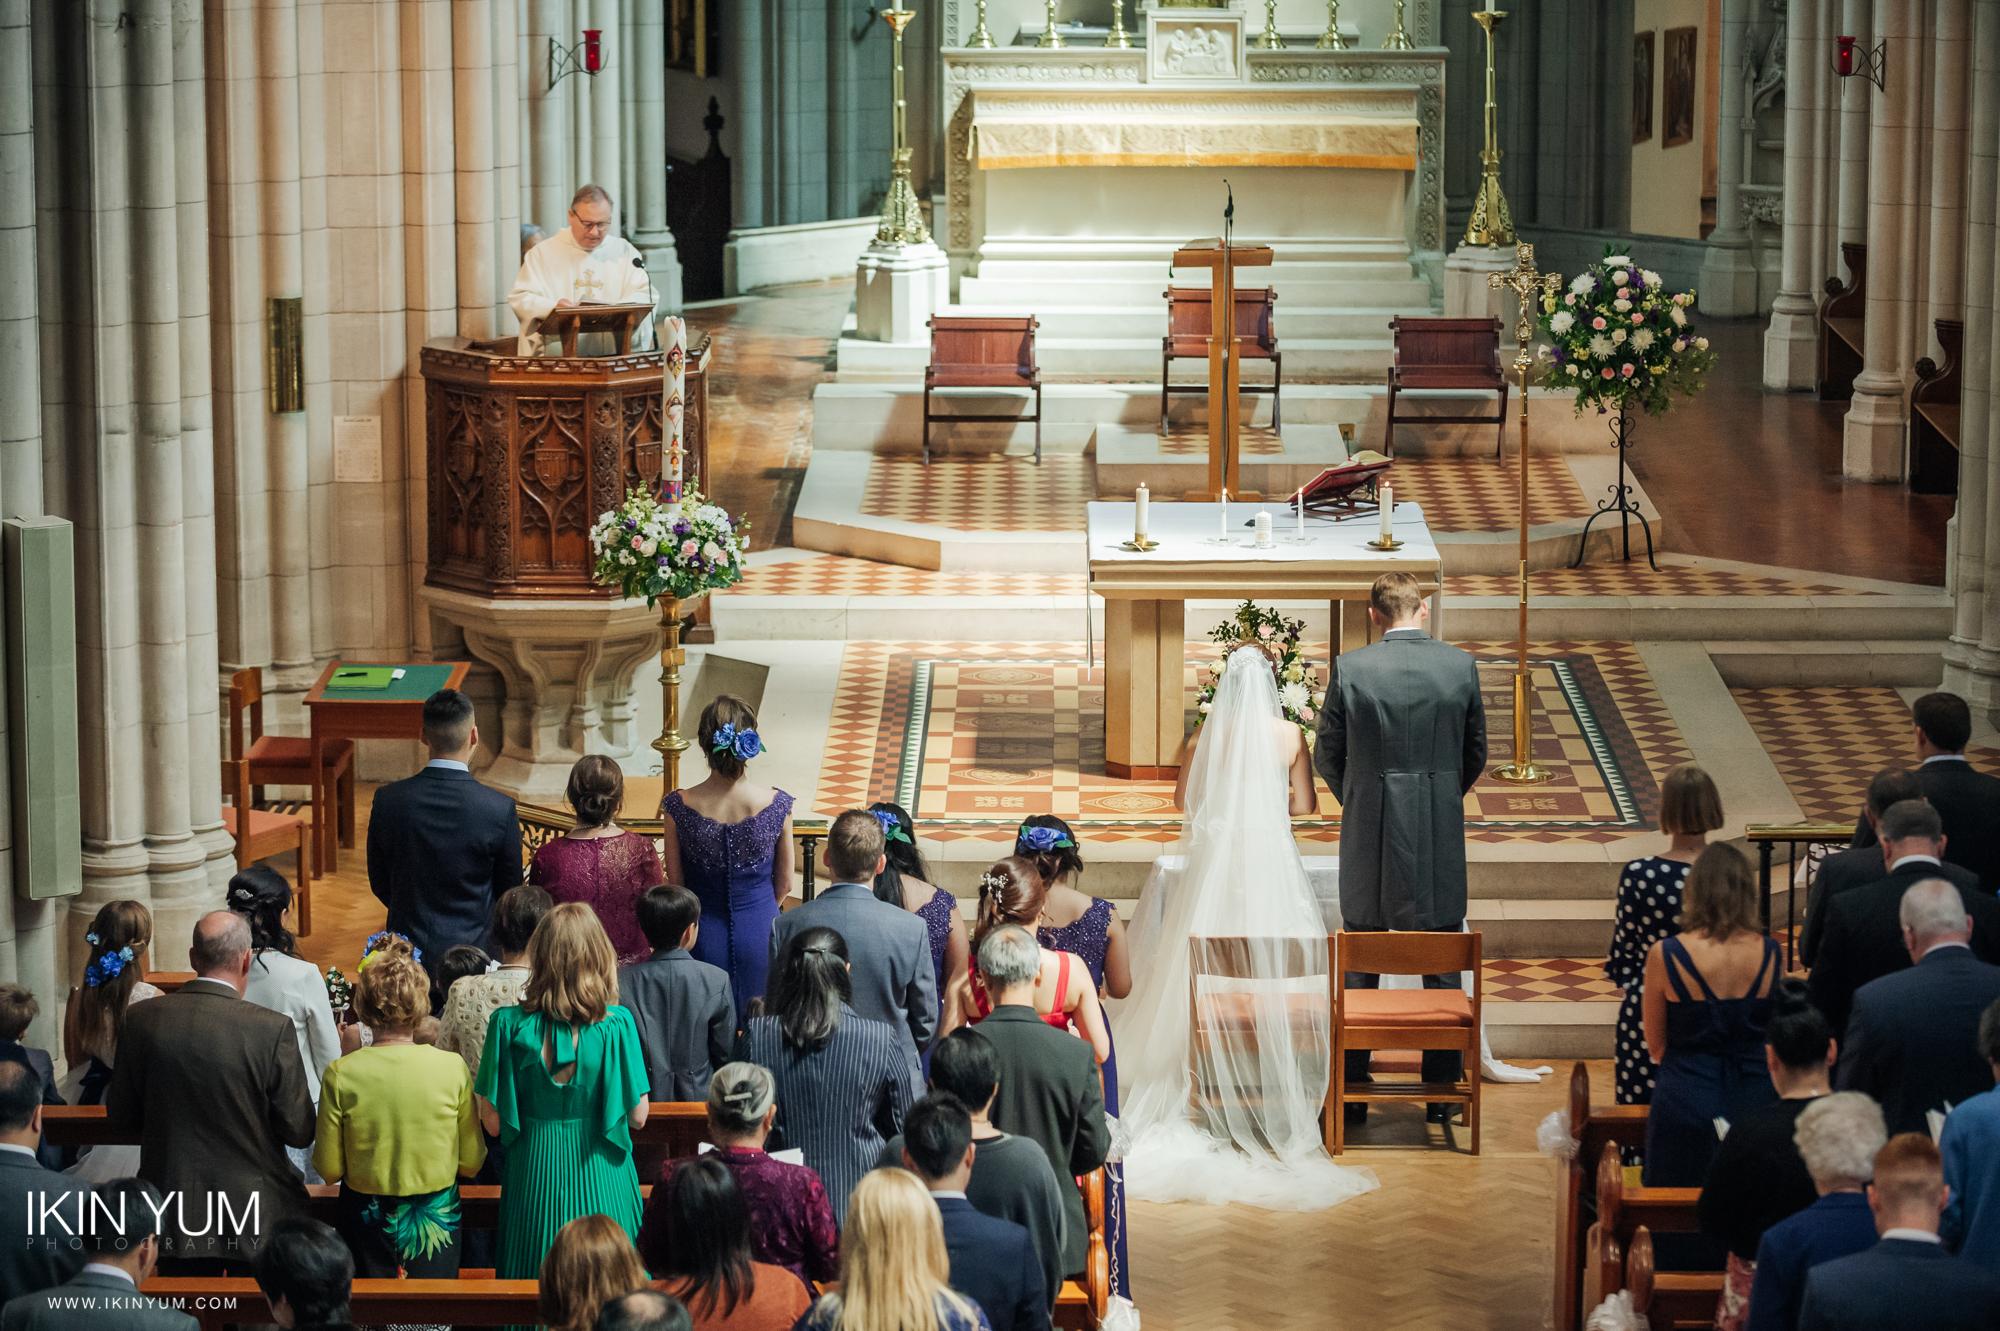 Teresa & Johnathan Weddong Day - The Ceremony-0063.jpg